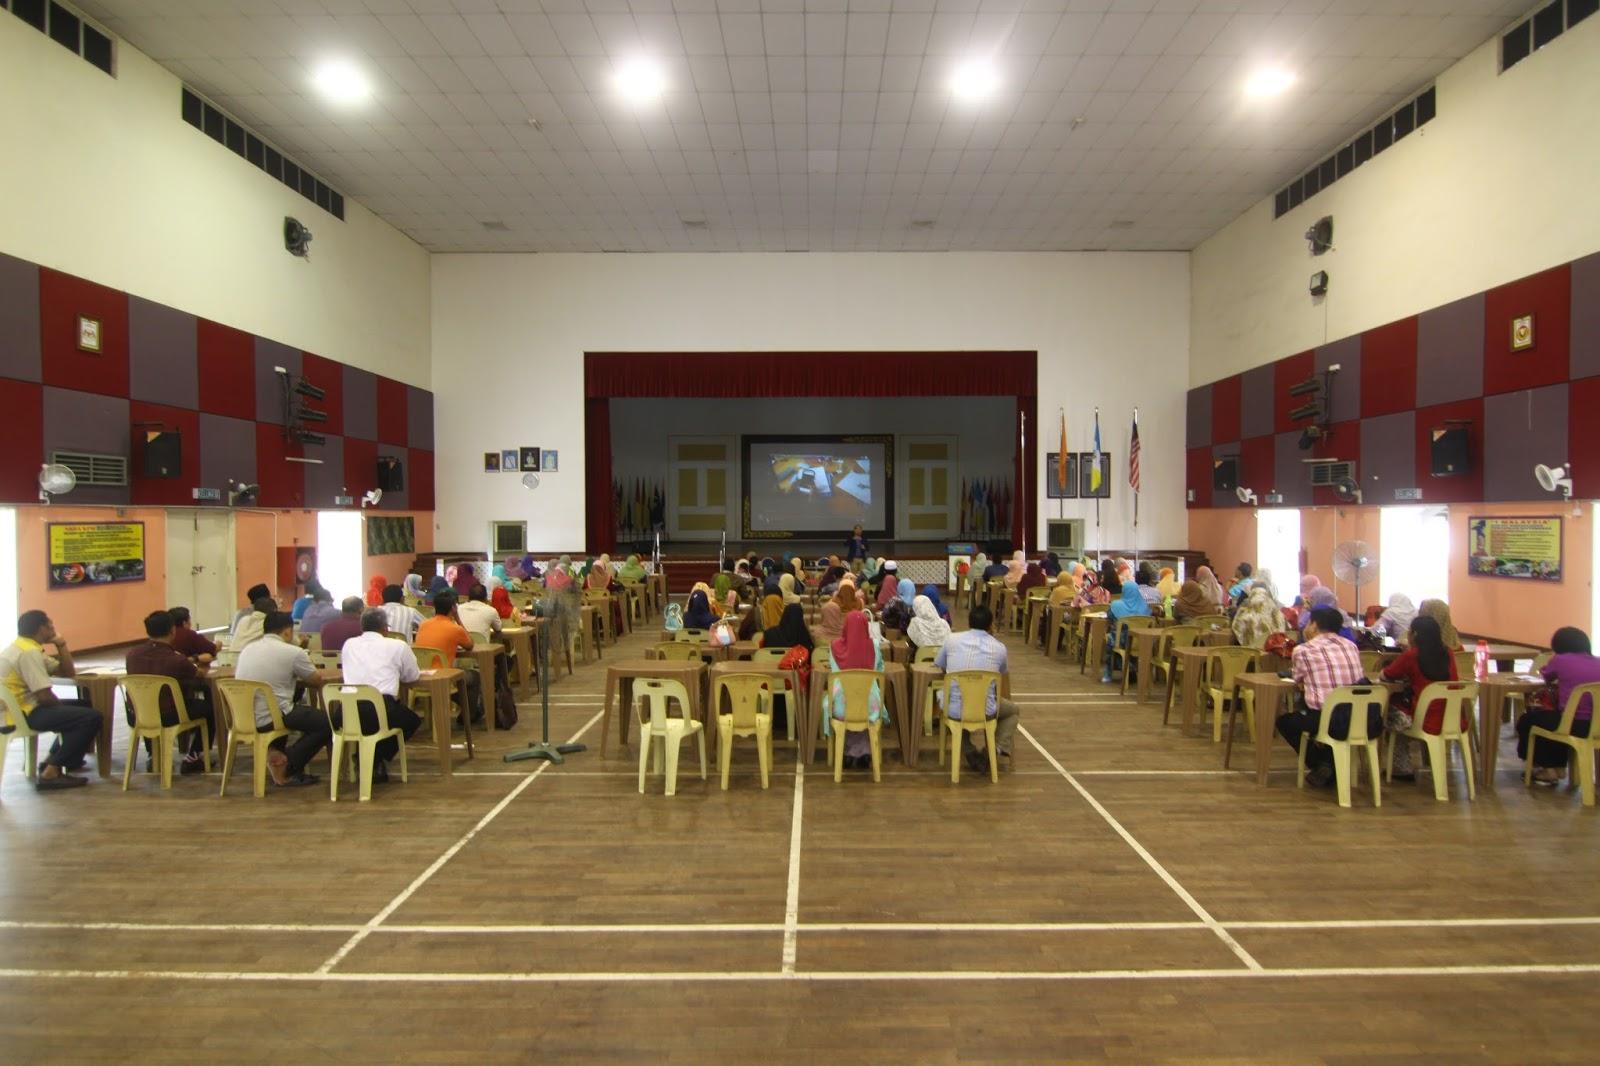 Bengkel Pak21 Di Sm Sains Kepala Batas Pulau Pinang